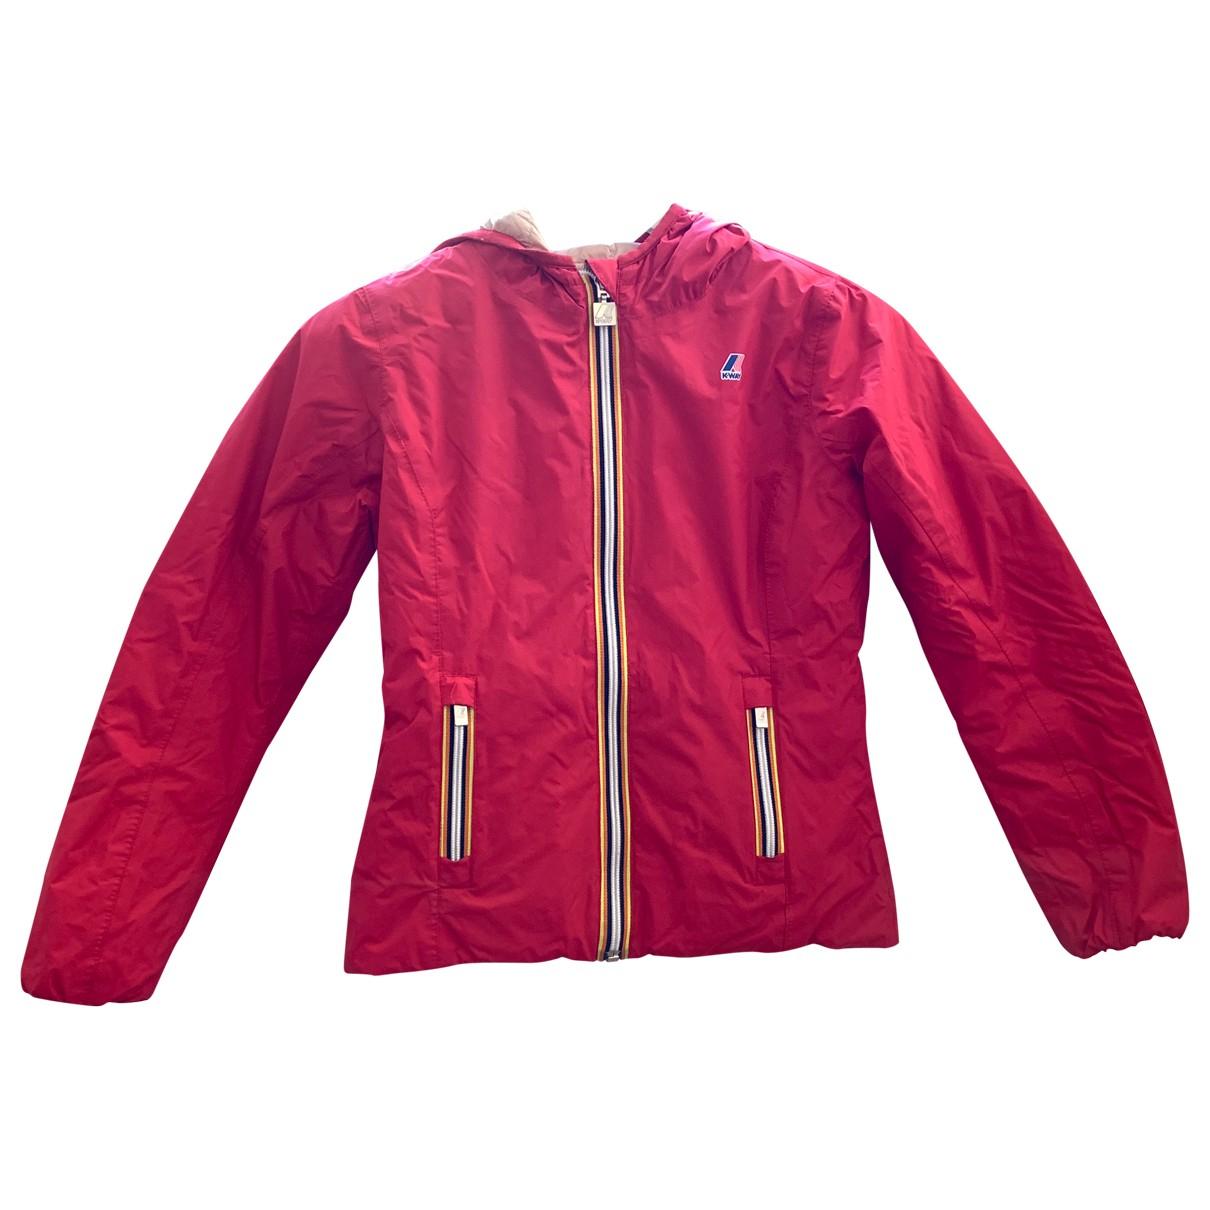 K-way \N Jacke, Maentel in  Rot Polyester